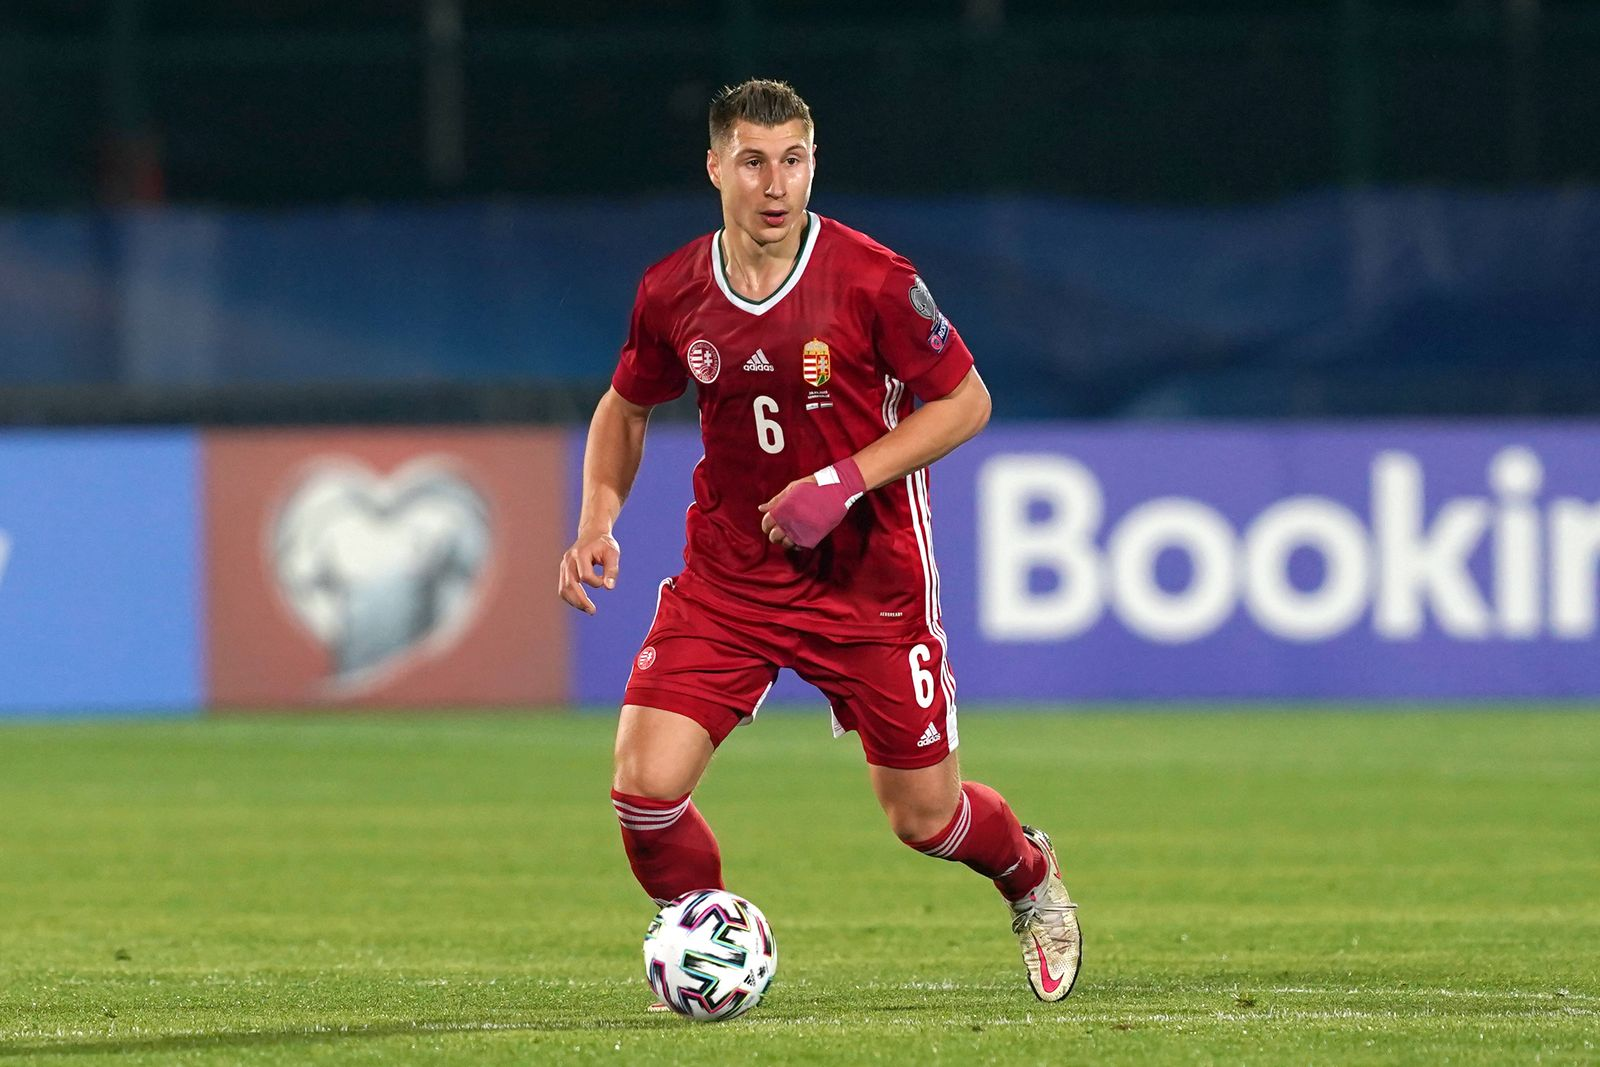 FIFA World Cup, WM, Weltmeisterschaft, Fussball 2022 QUALIFYING ROUND, 28-03-2021, SAN MARINO-HUNGARY UNGHERIA 0-3, WIL